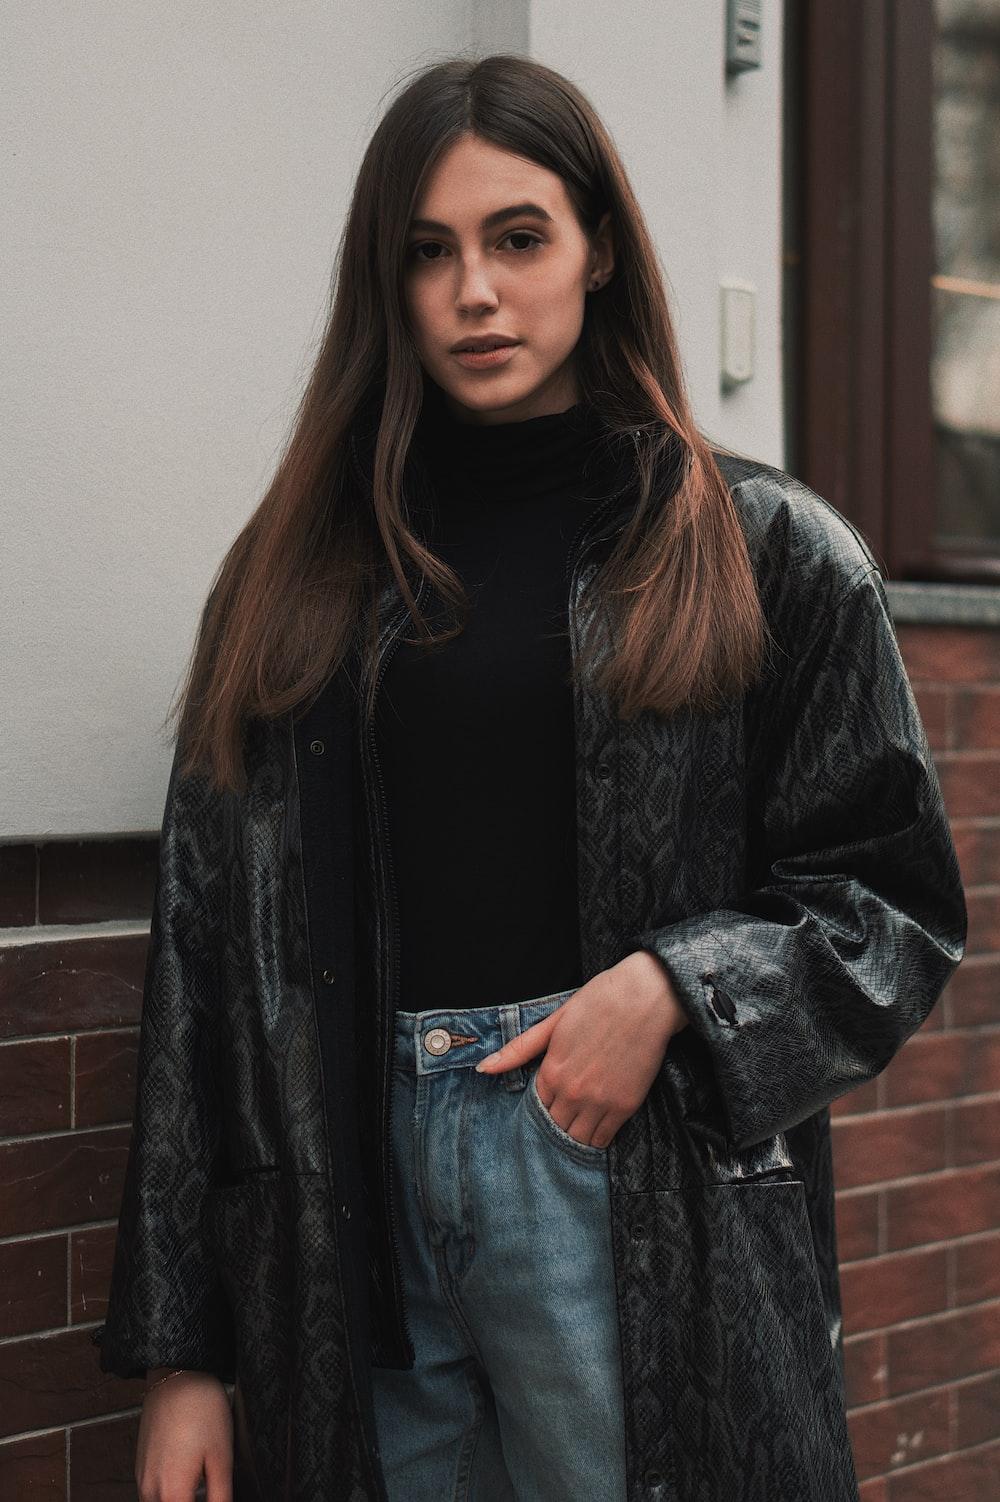 woman wearing black floral coat